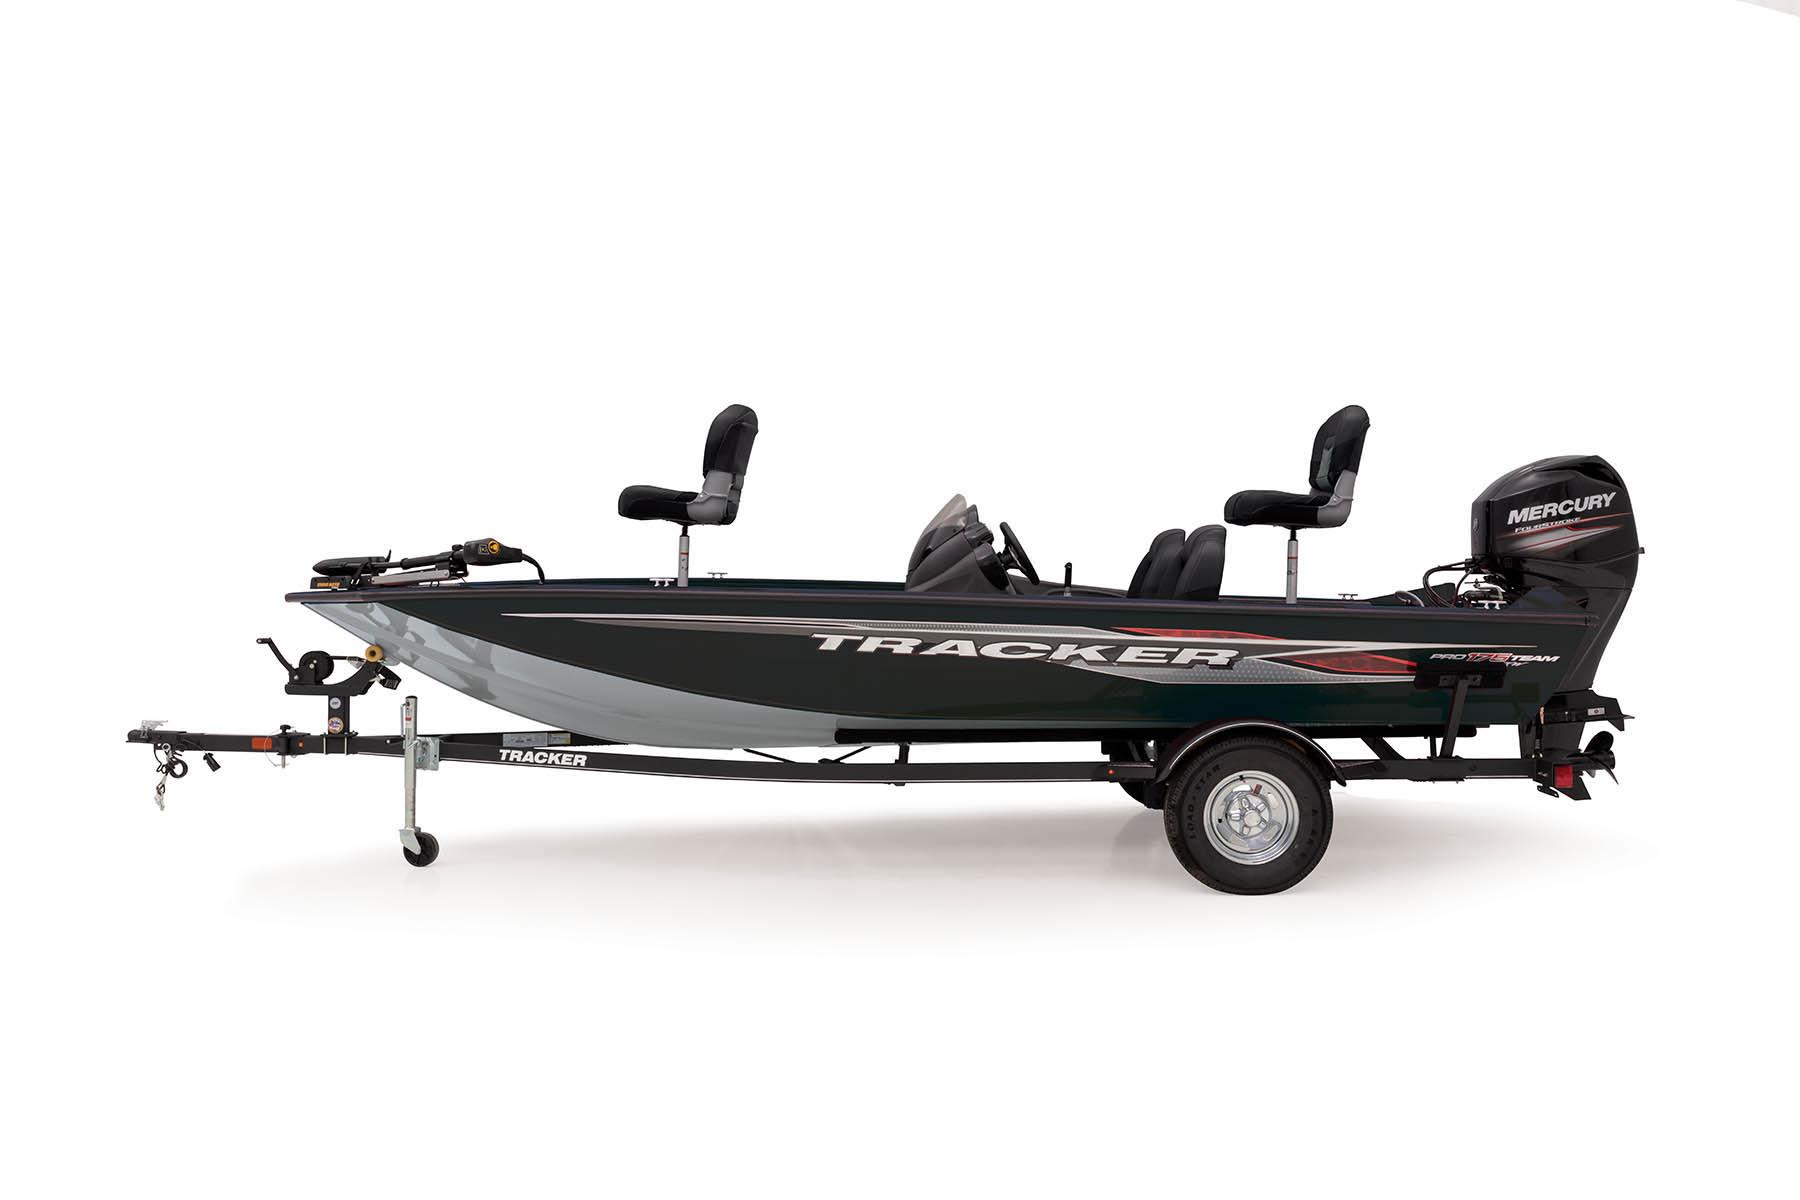 2019 PRO TEAM 175 TXW - TRACKER Mod V Bass Boat   Bass Tracker Boat Electrical Wiring      Tracker Boats